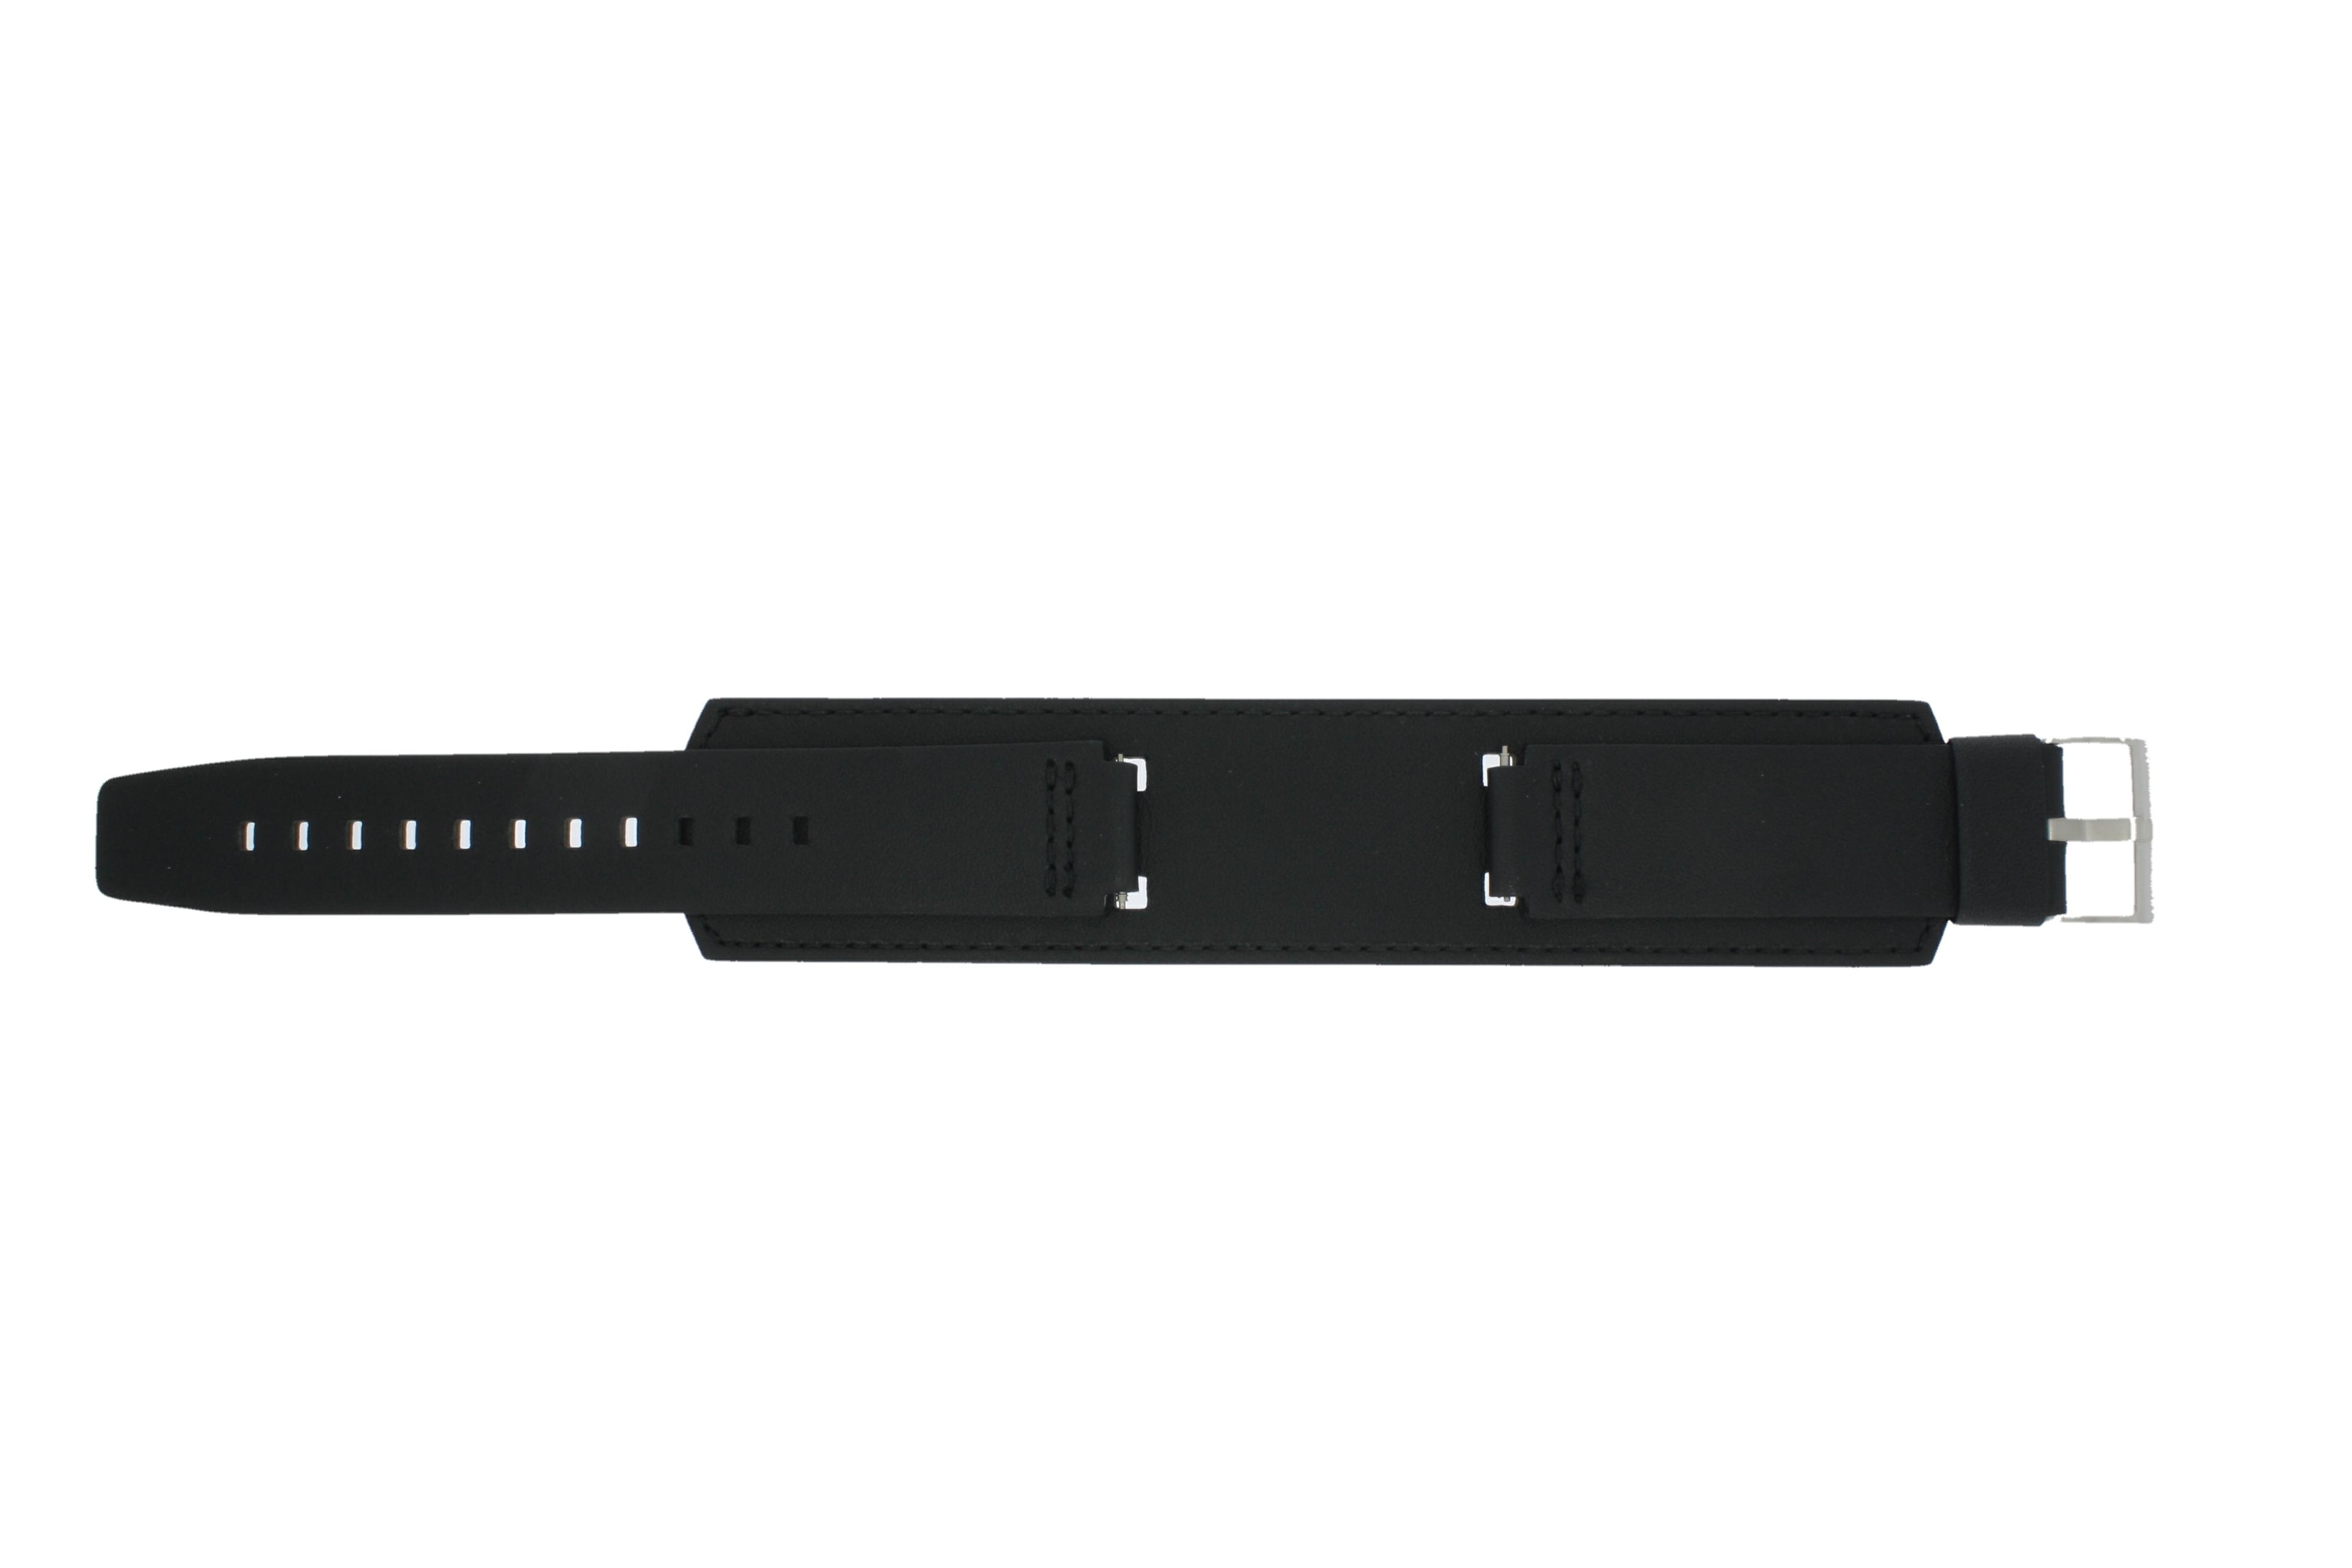 Casio klockarmband WV-300DE - WV-300LA-1V - IRW-100BJ-1J / 10209394 Läder Svart 16mm + sömmar svart